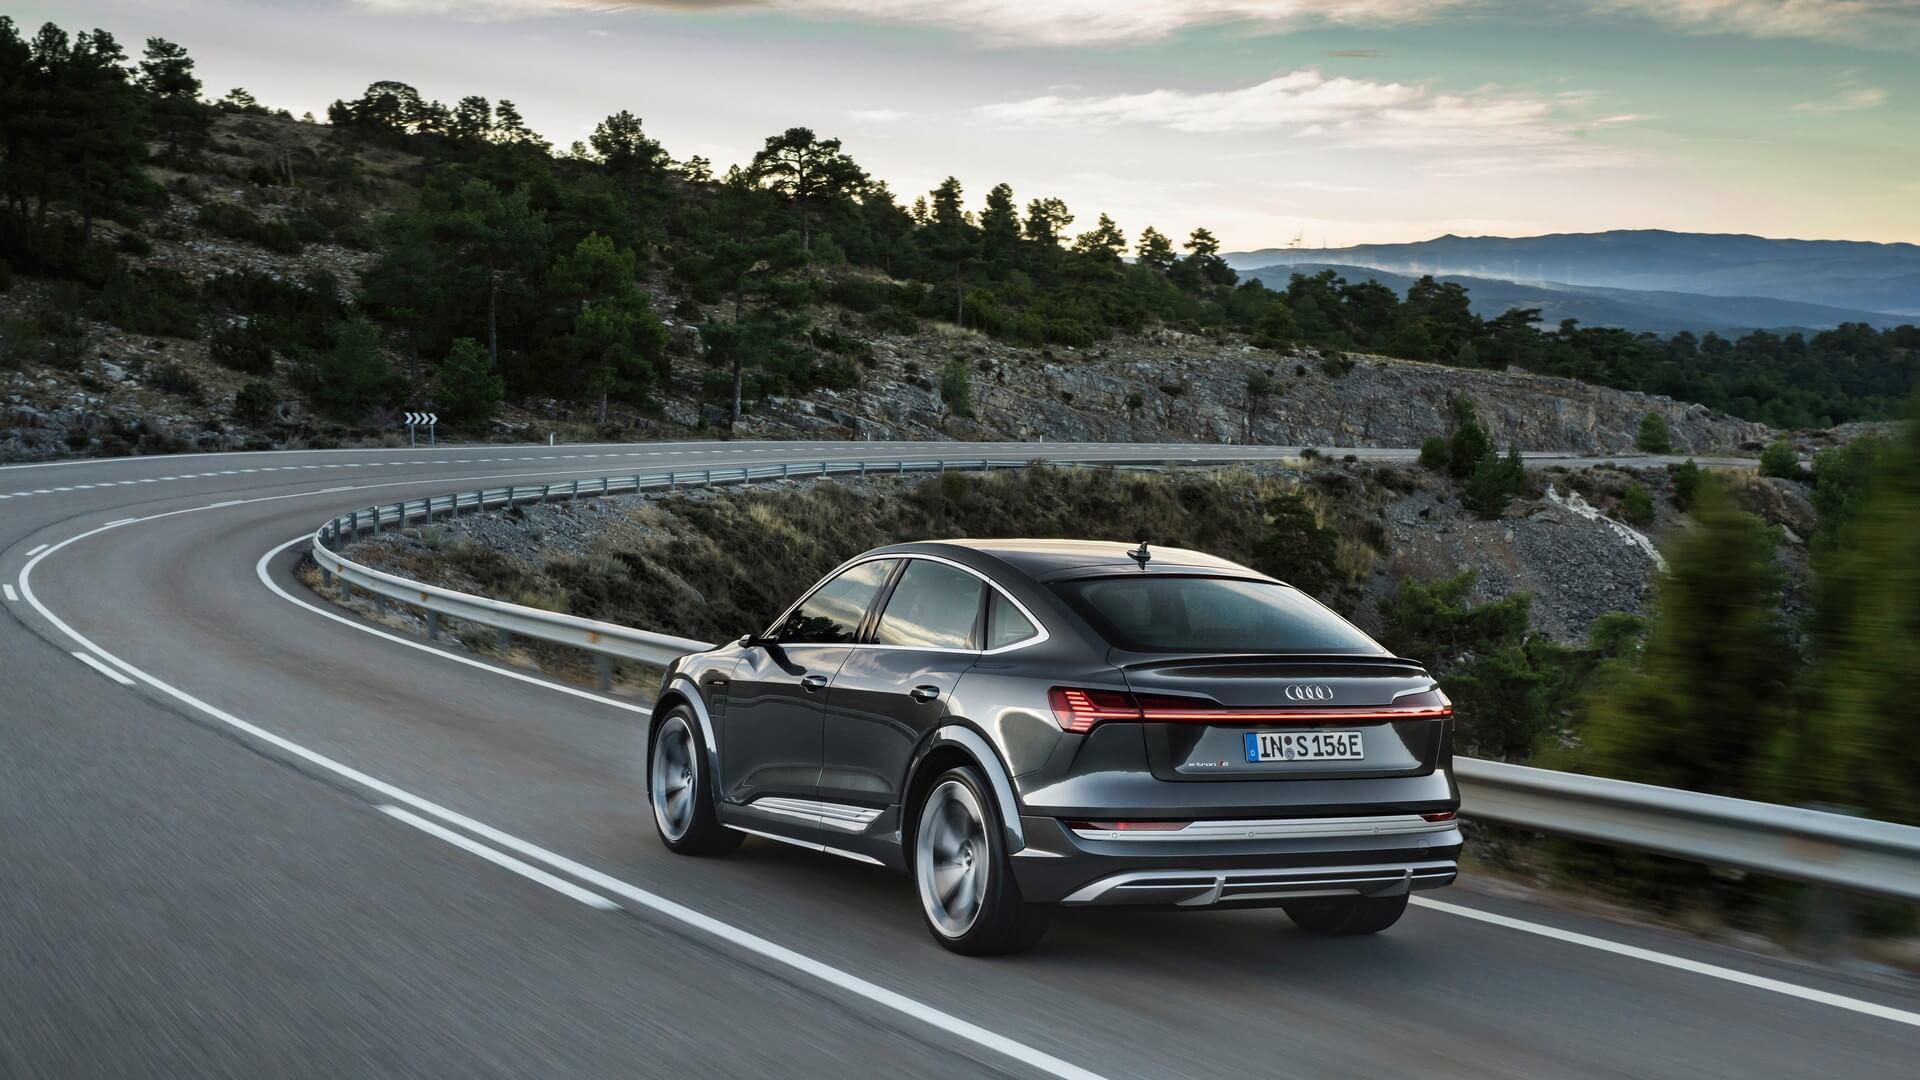 Audi-E-Tron-S-and-E-Tron-S-Sportback-2020-58